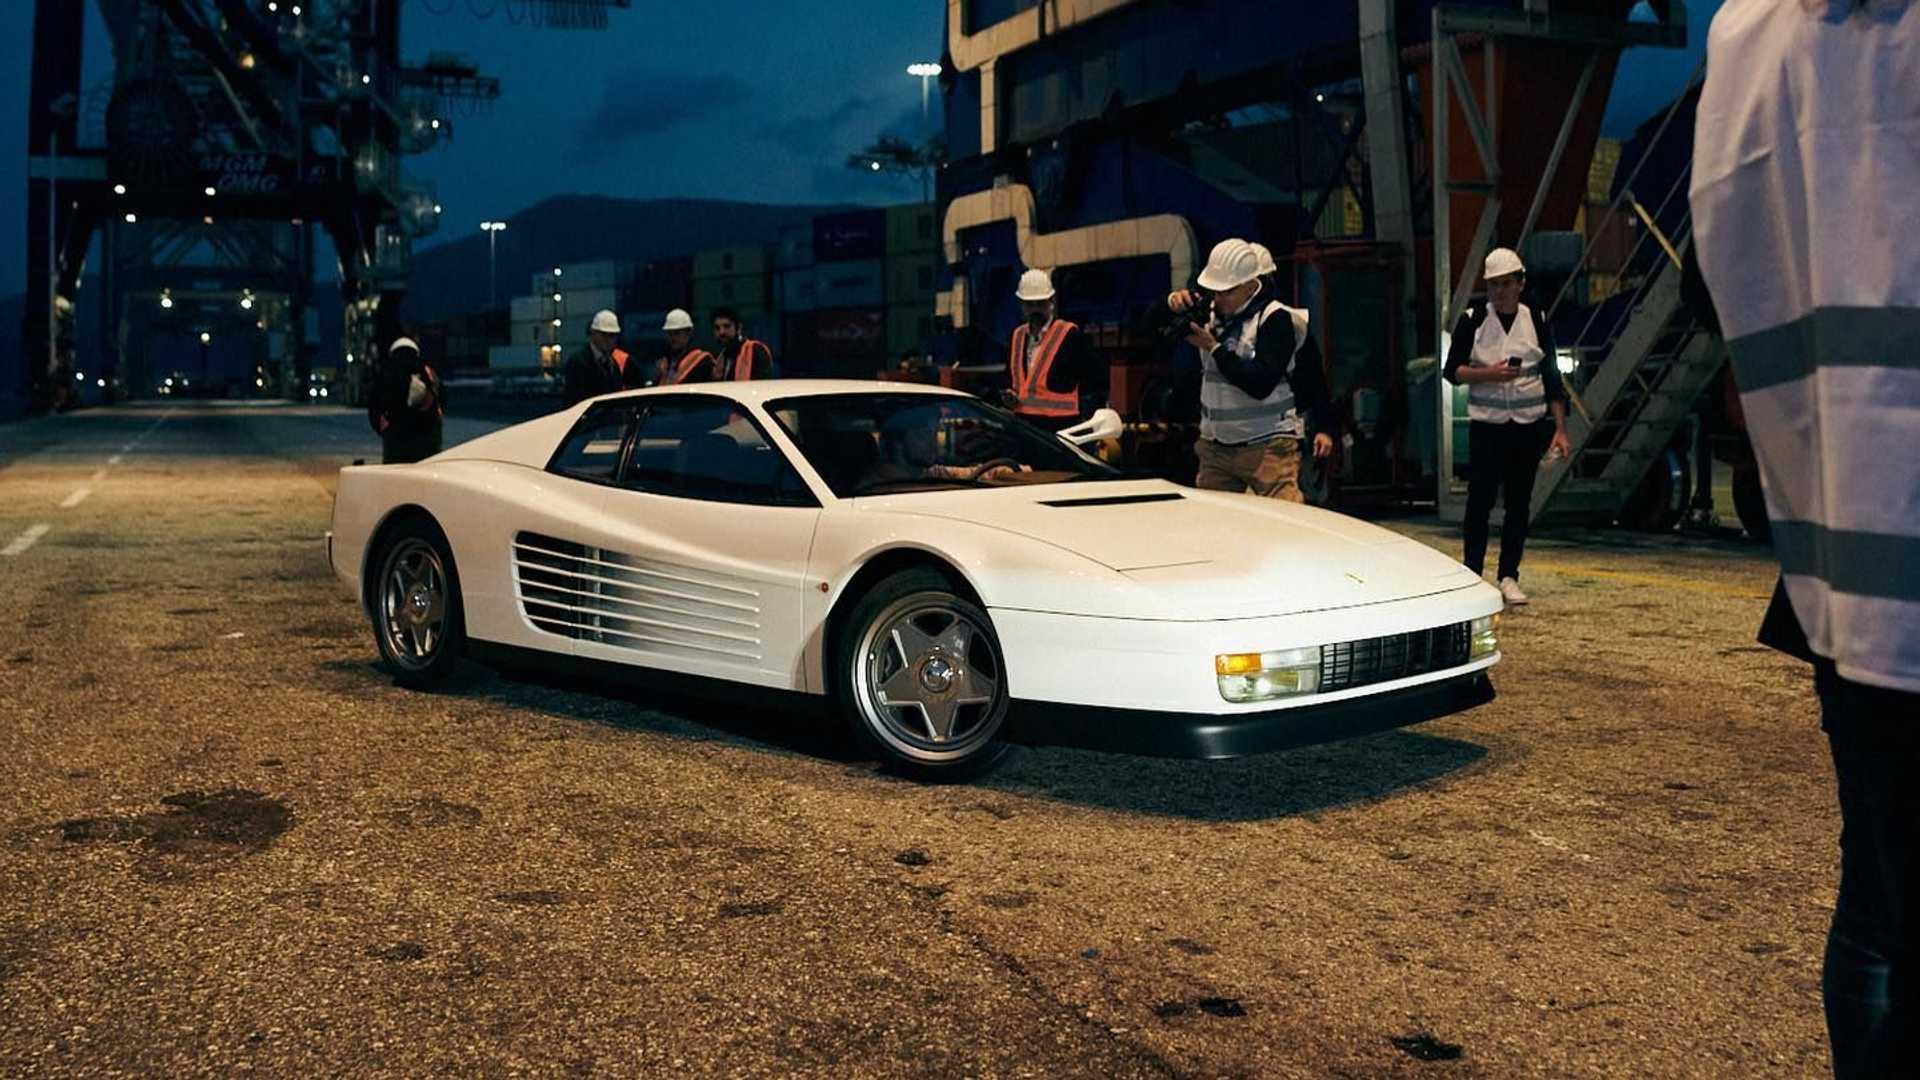 Ferrari-Testarossa-restomod-Officine-Fioravanti-8